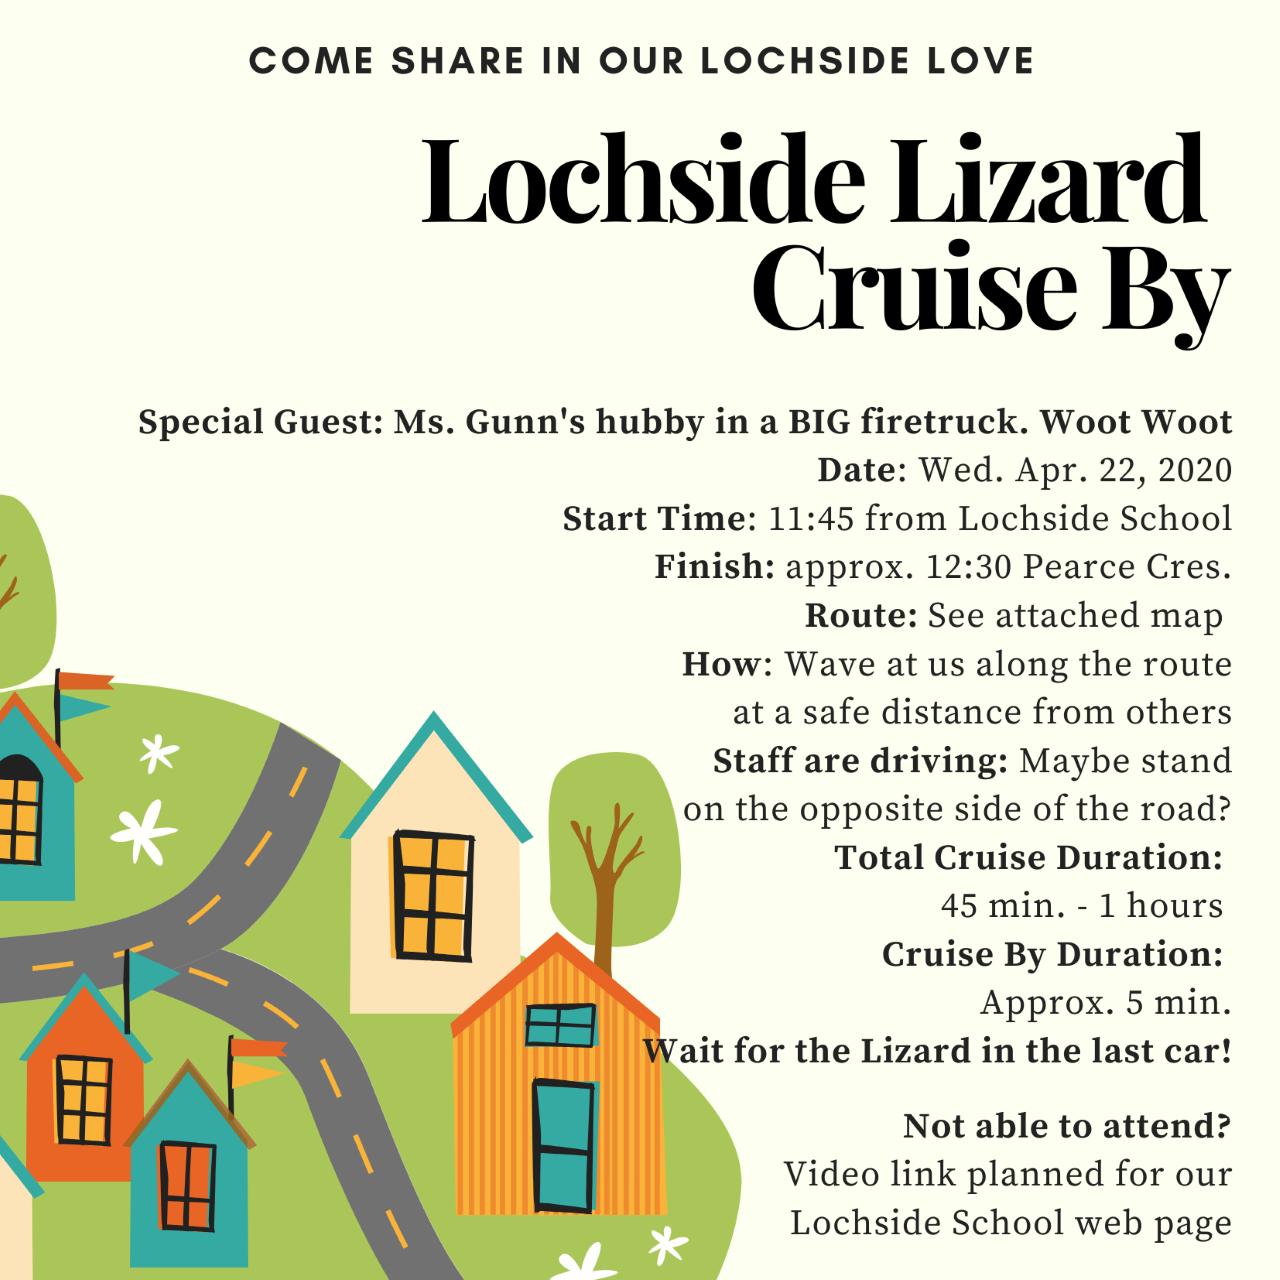 cruise by invite